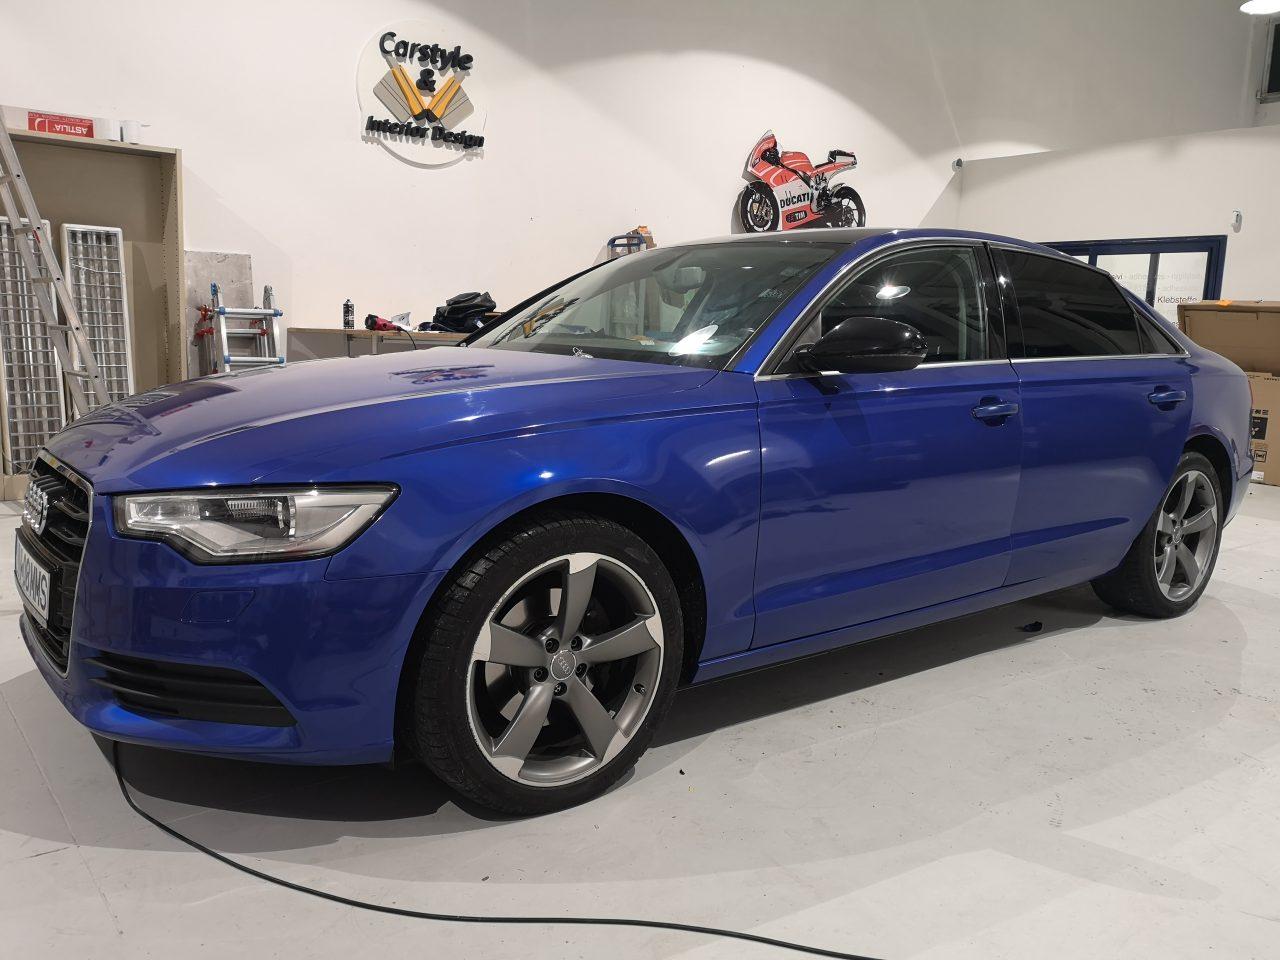 Audi Wrapping - Cantarelli Group